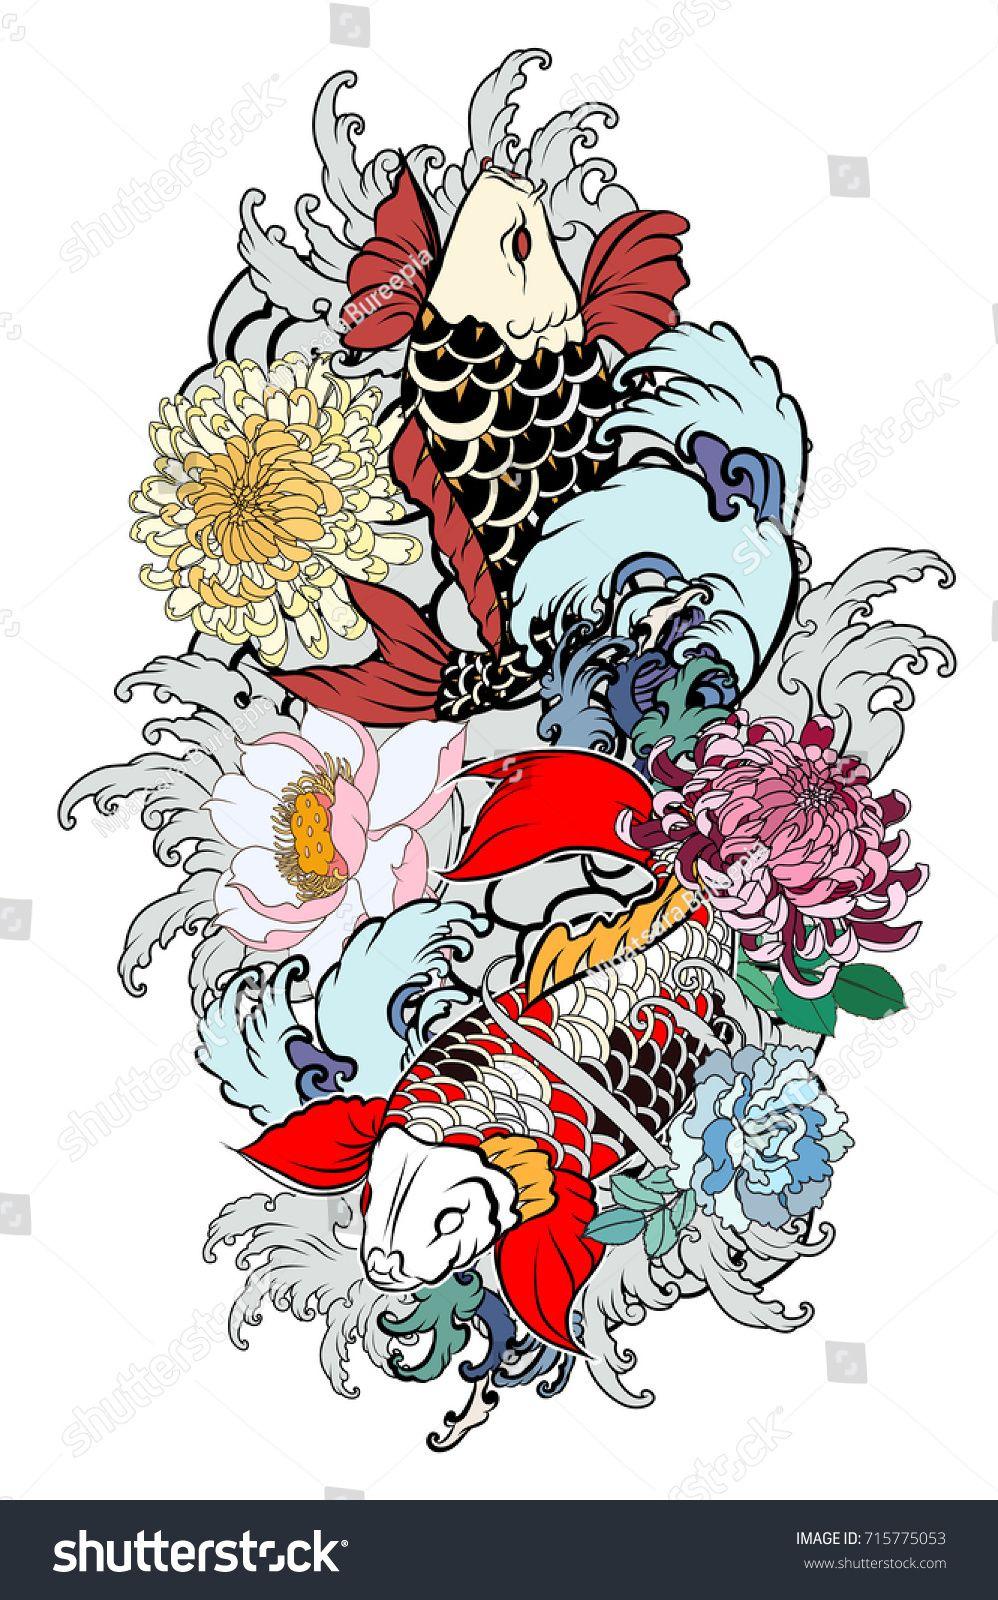 Beautiful Colorful Koi Carp With Water Splash Lotus And Peony Flower Traditional Japanese Tatt Japanese Tattoo Designs Japanese Peony Tattoo Japanese Tattoo